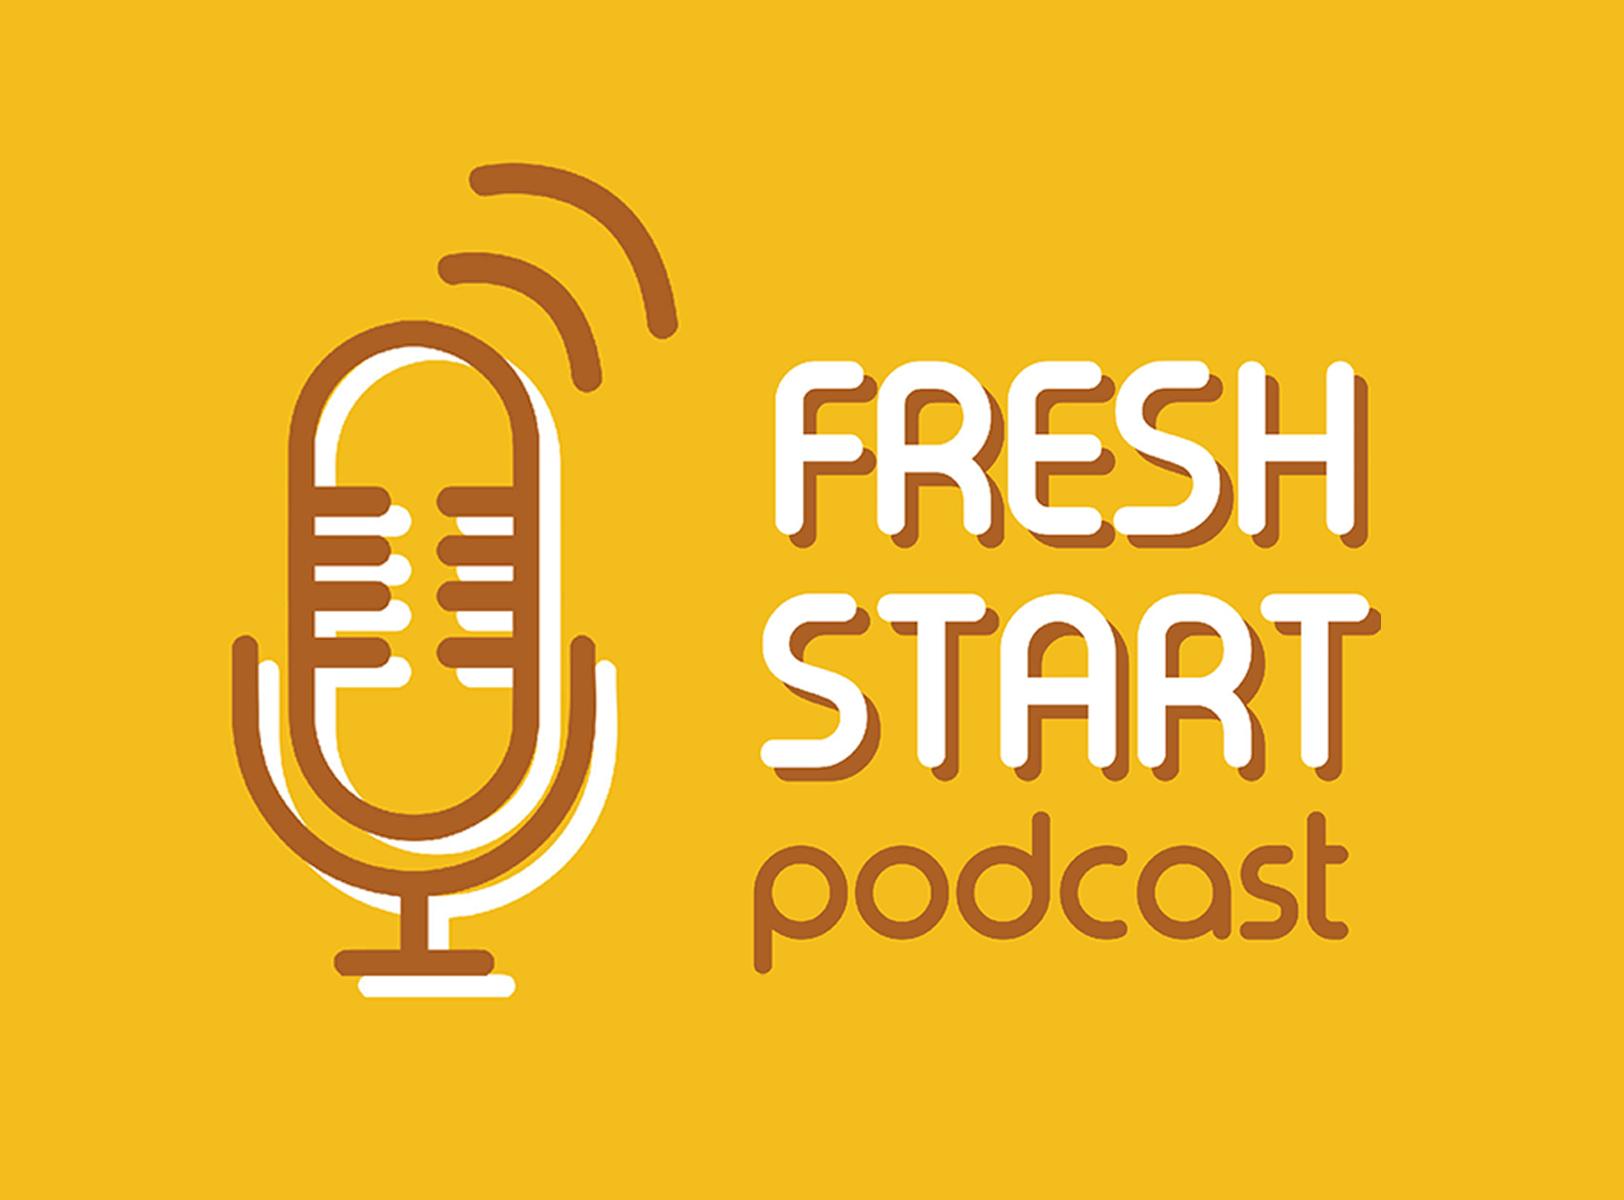 Fresh Start: Podcast News (1/28/2020 Tue.)